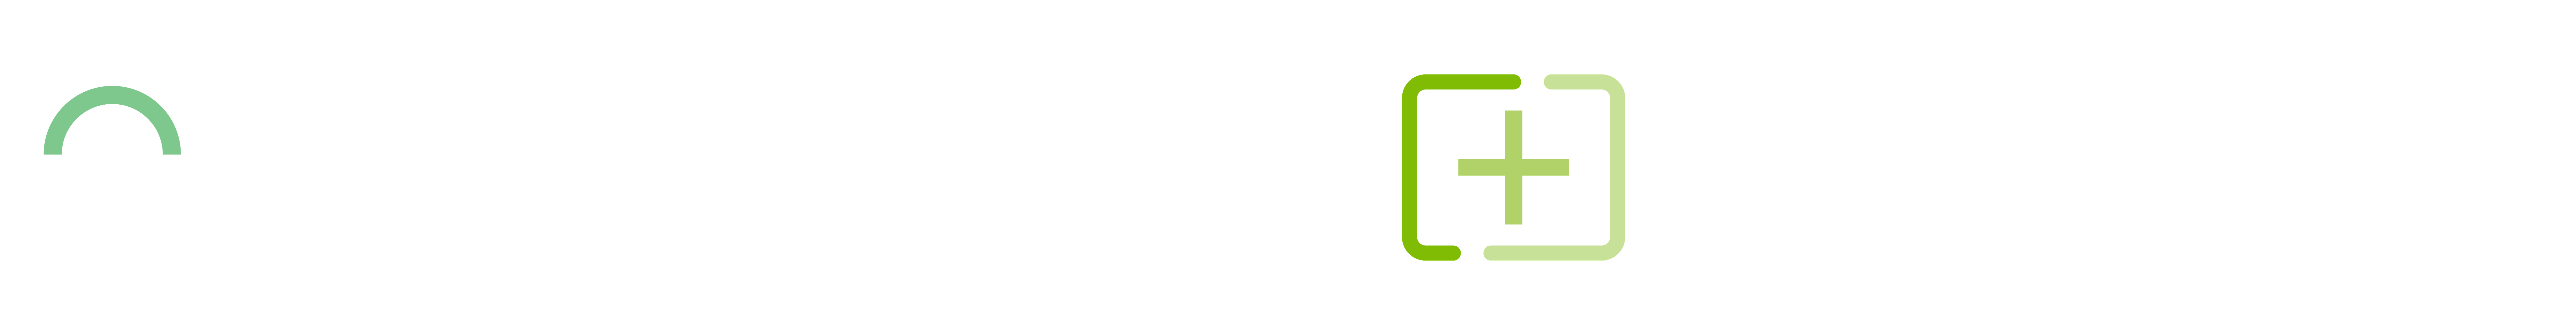 nwRazor-logo_unaligned